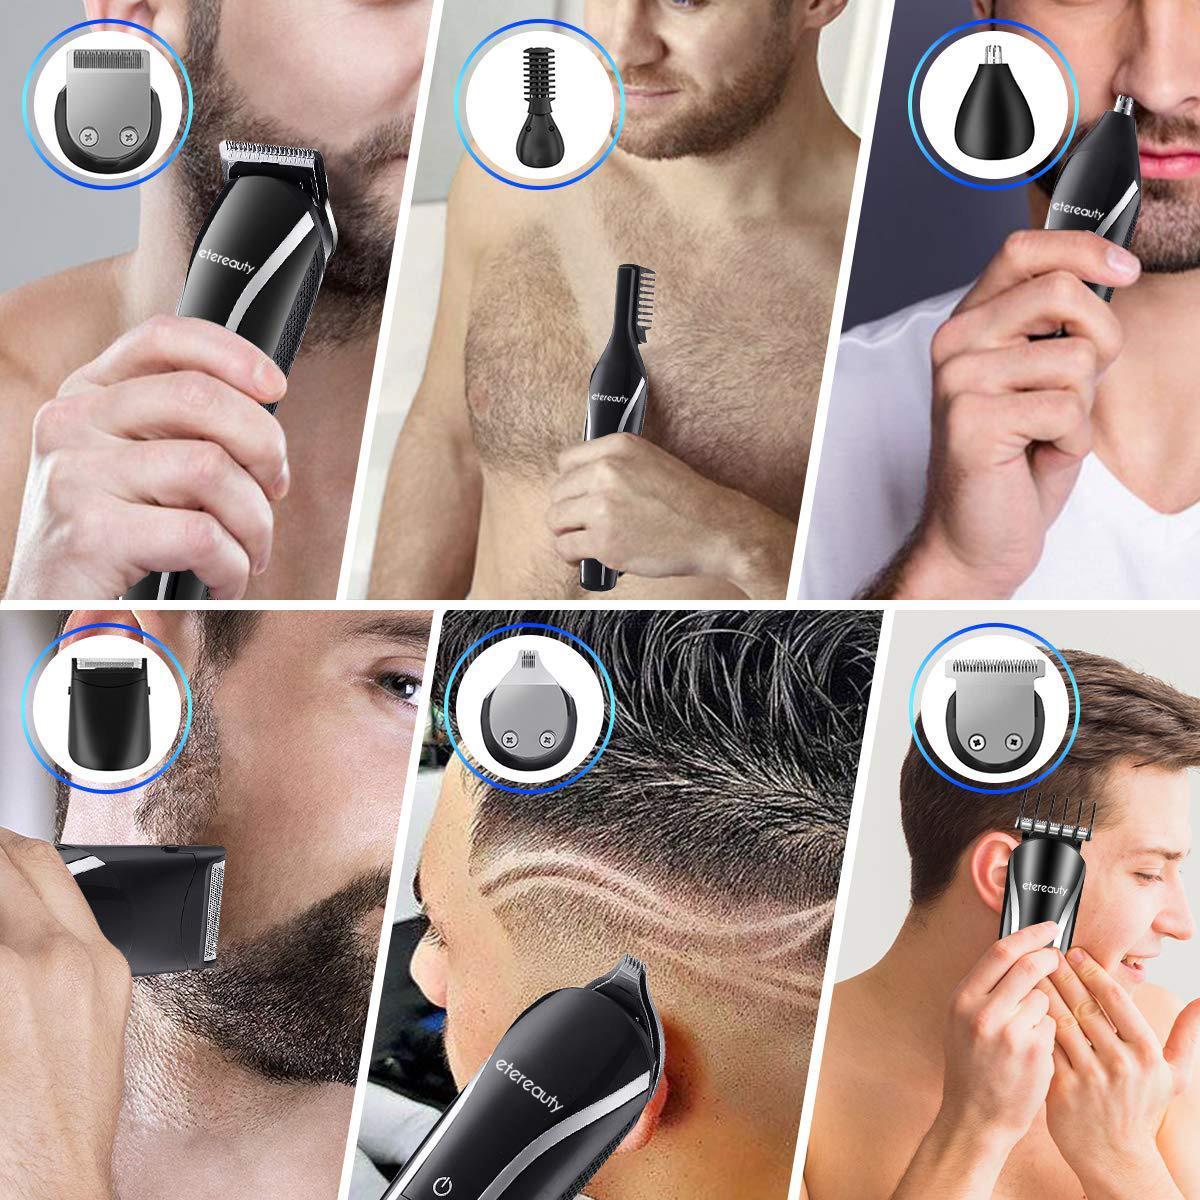 11 In 1 Multi-Functional Grooming Kit, Cordless Waterproof Hair Beard Trimmer Haircutting Kit